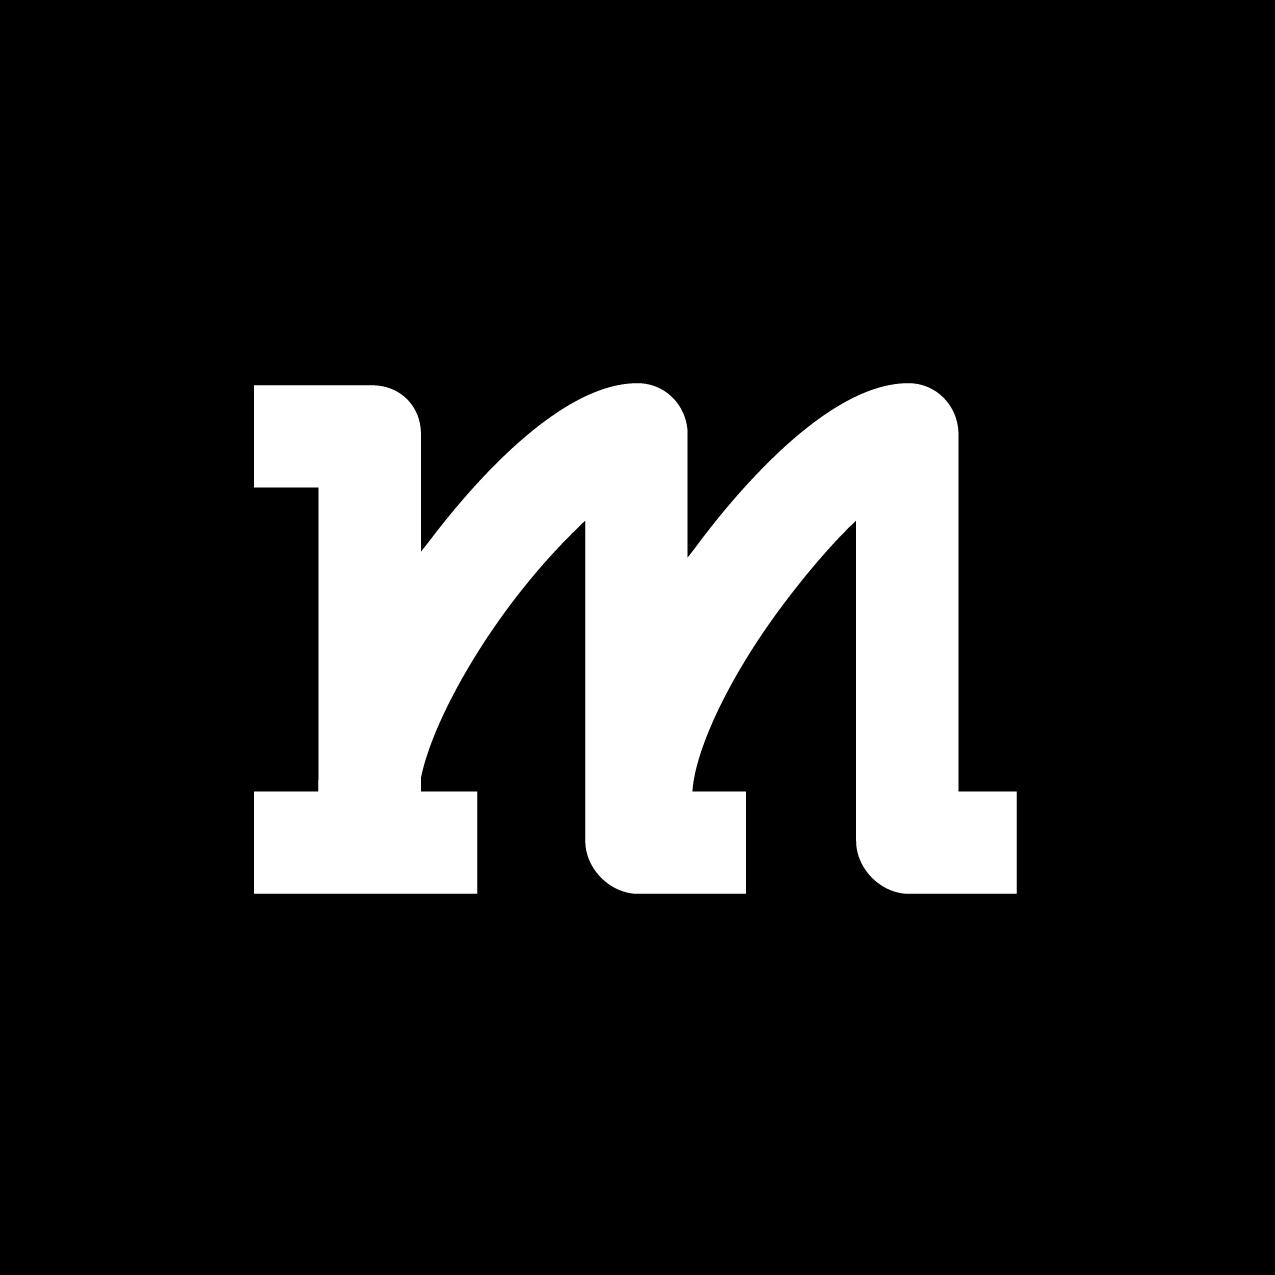 Letter M7 Design by Furia